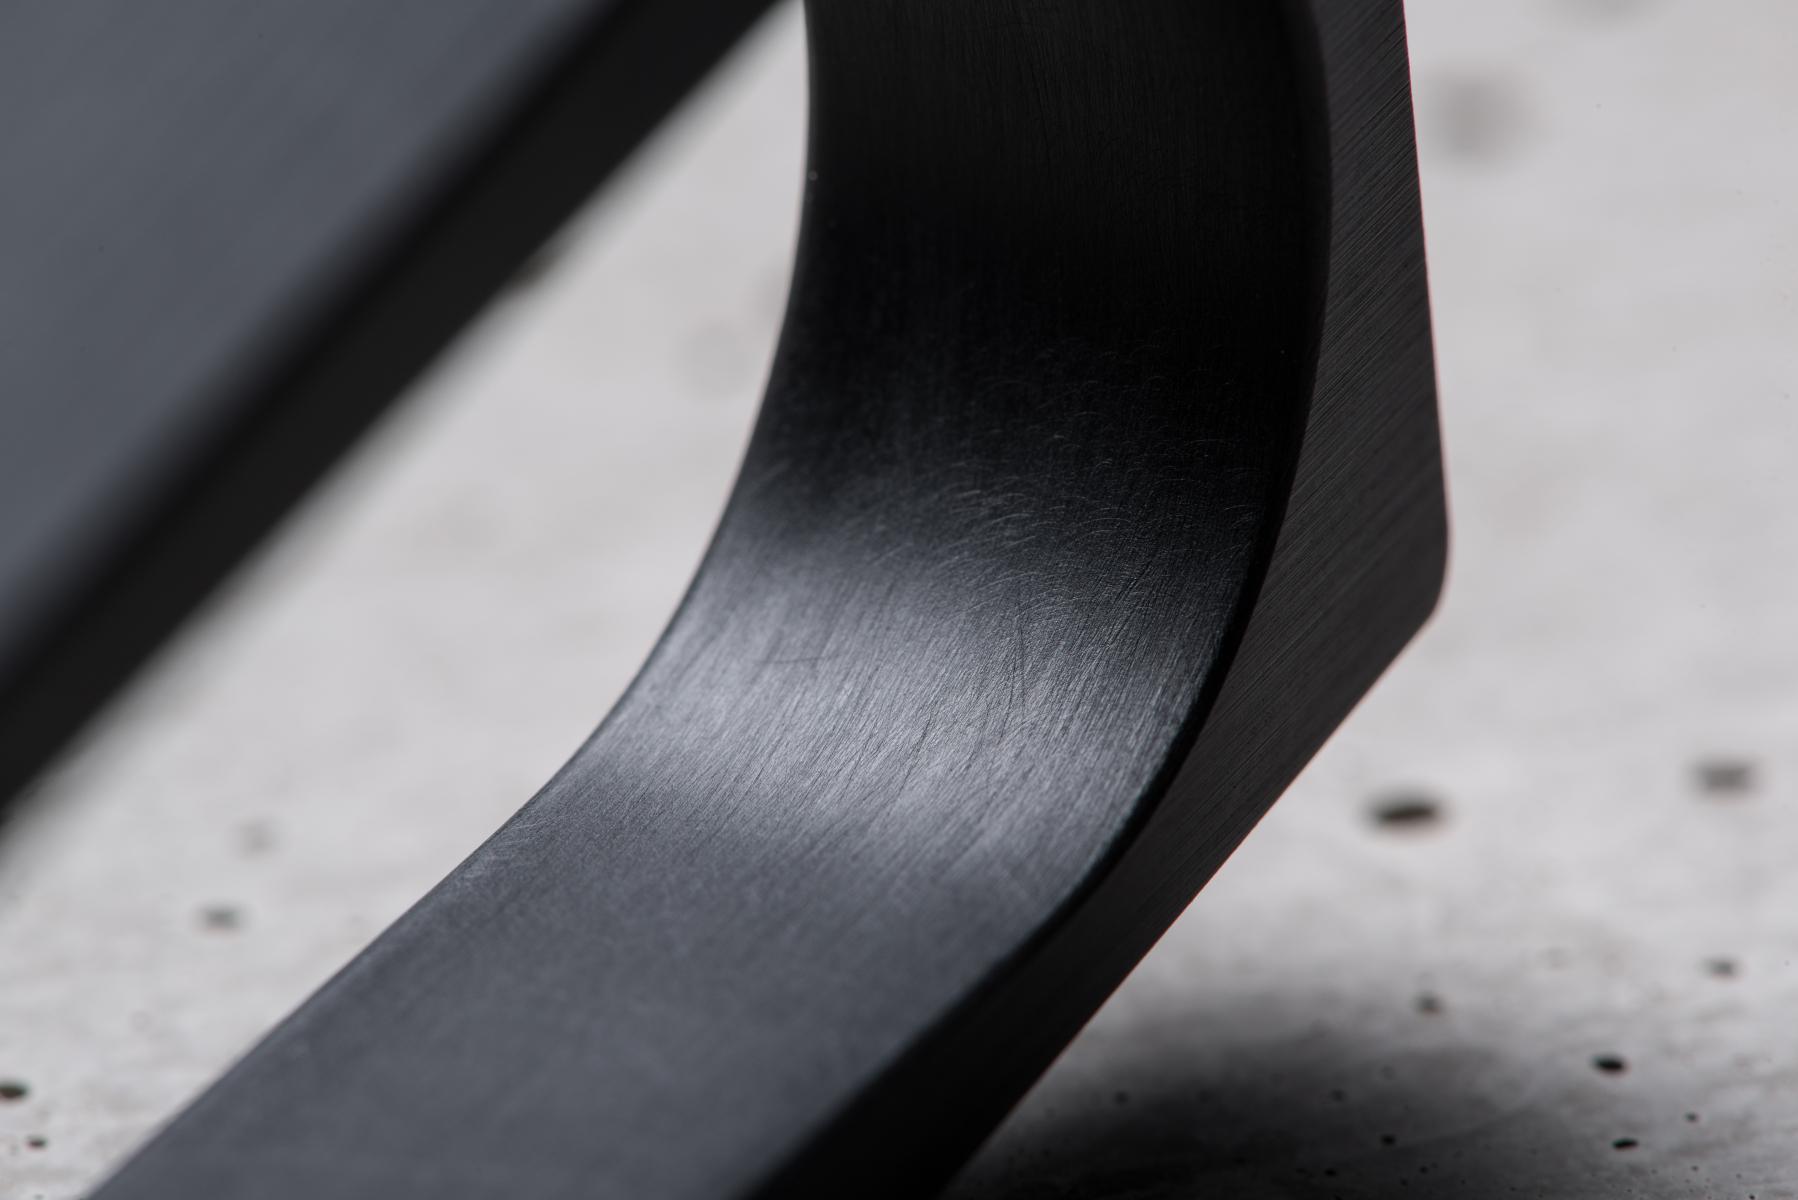 13&9 Design_GC-JEWELLERY_HEXA TRIPLE_MAN_detail buttom®Joel_Kernasenko_MOMA